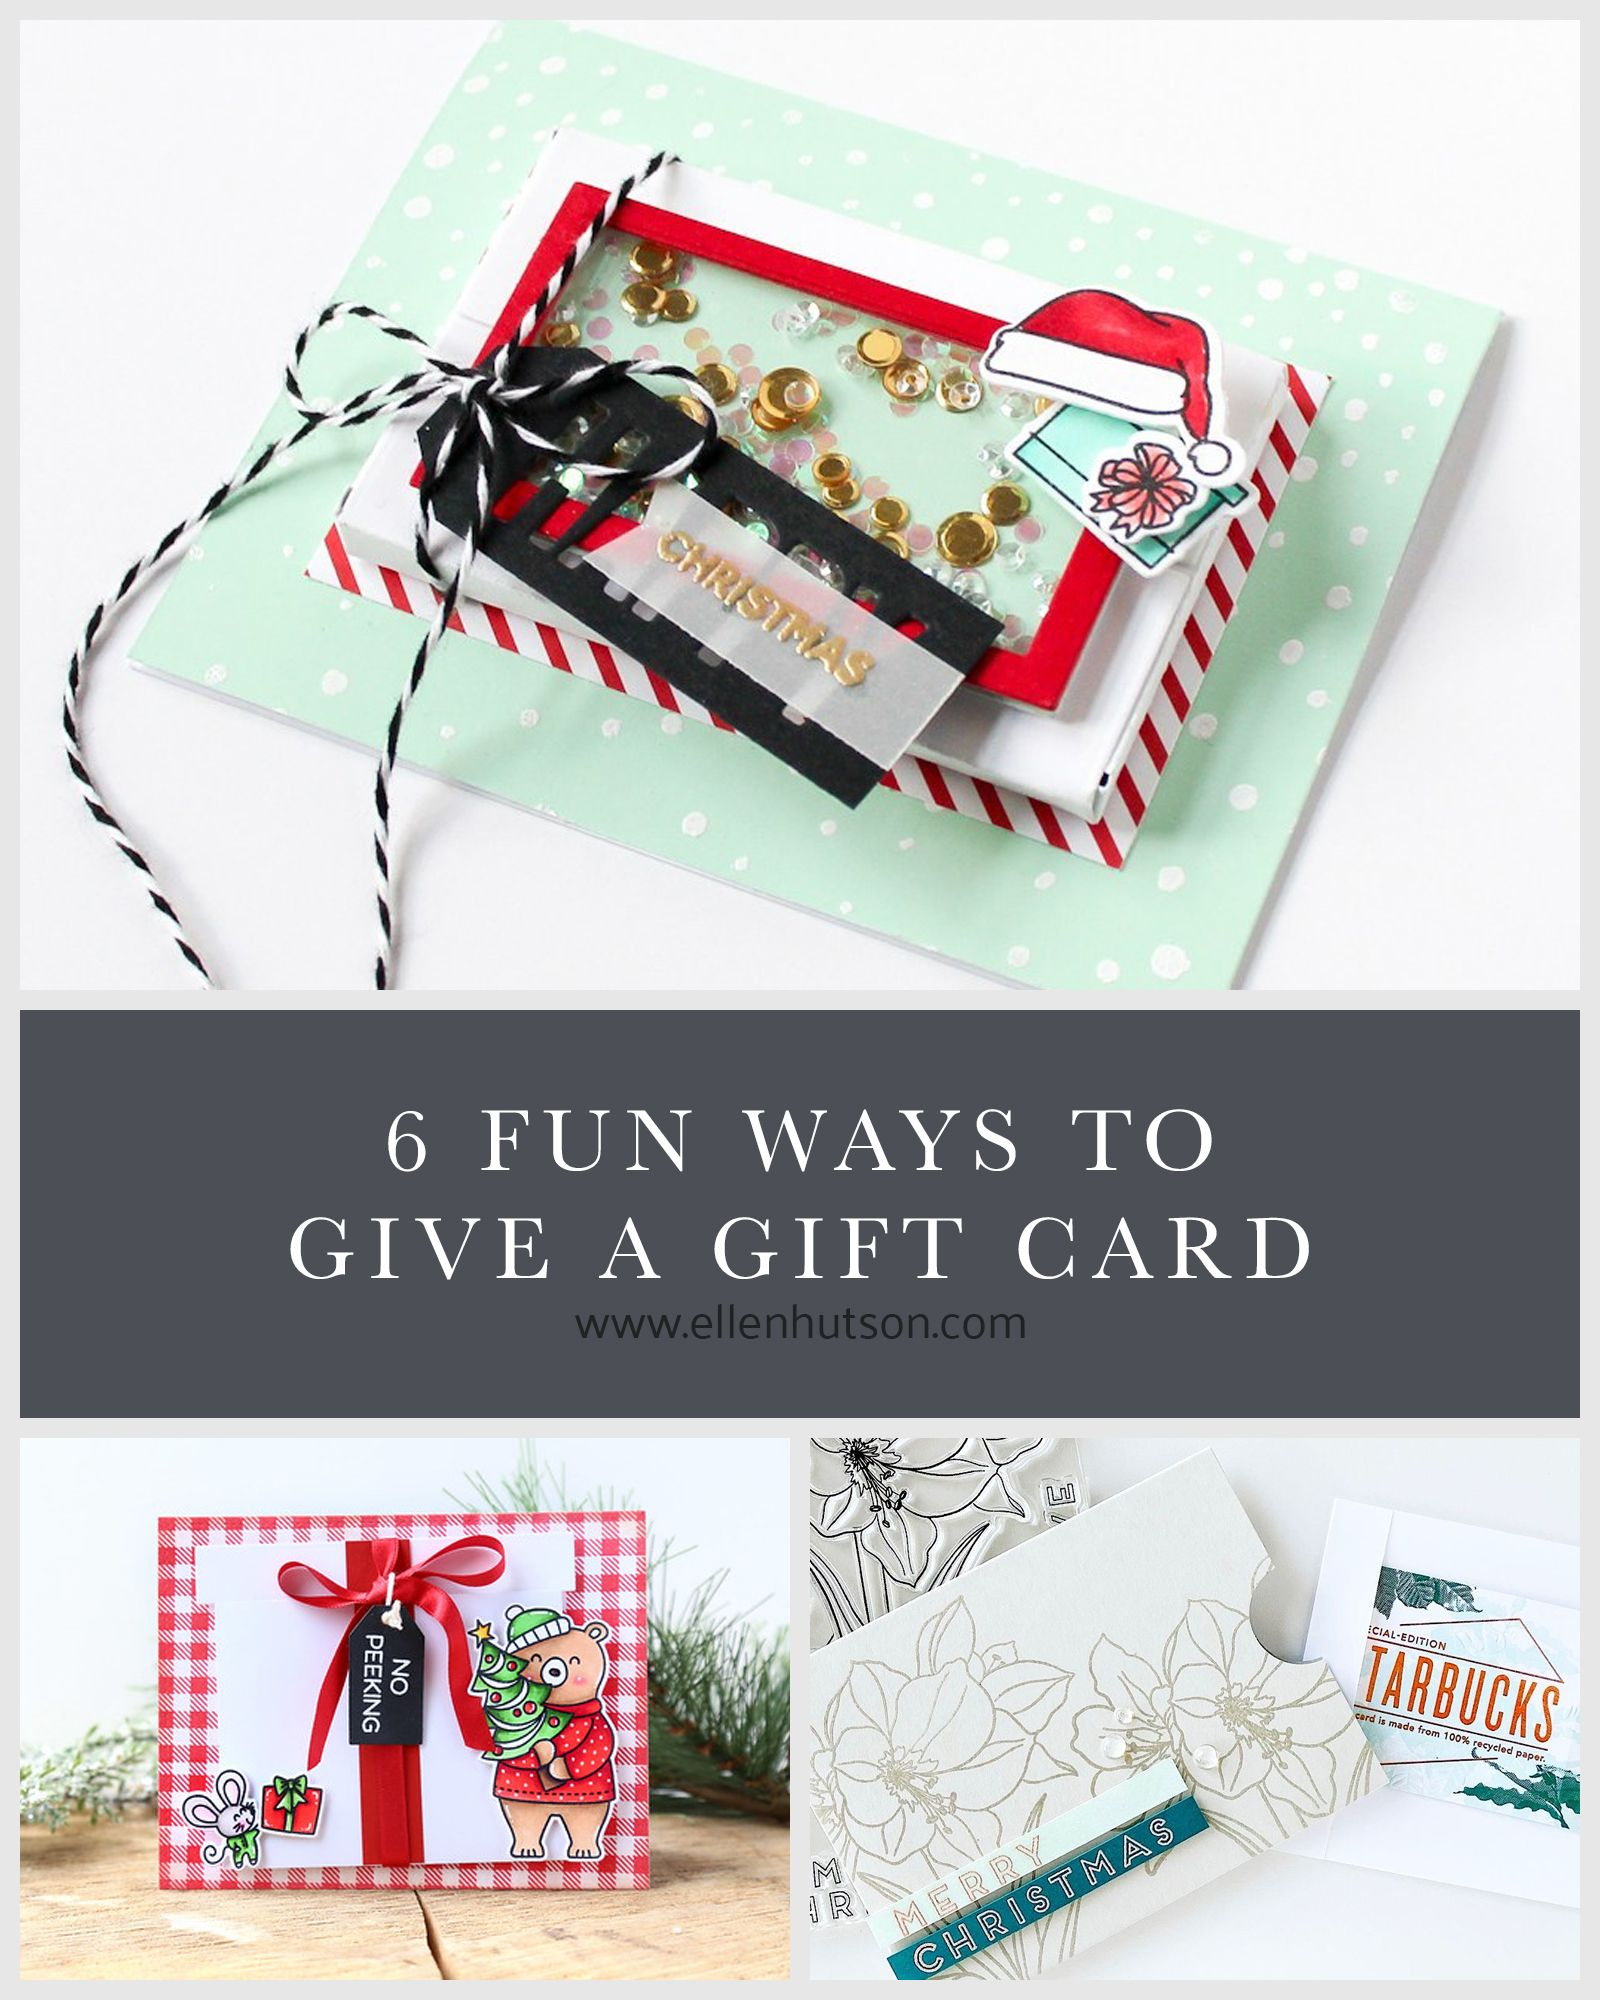 6 fun ways to give a gift card  ellen hutson  unique